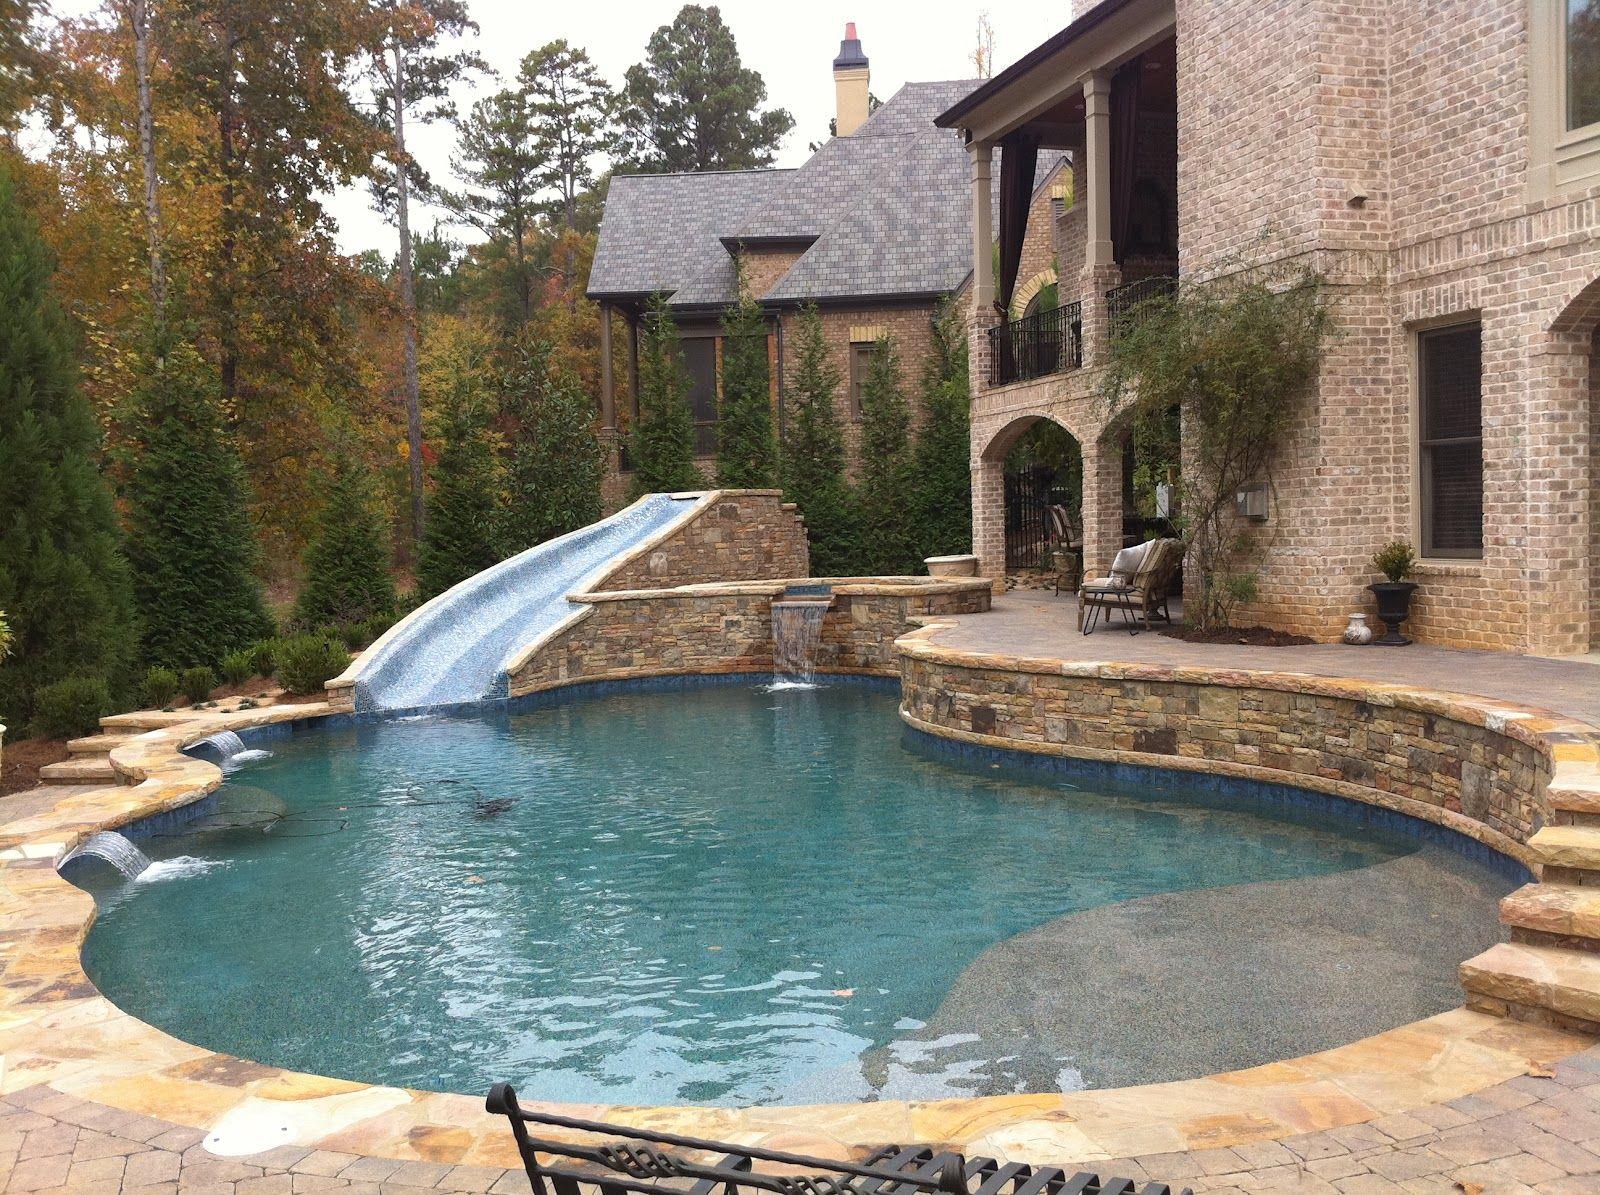 Backyard Oasis Pools Free Form Pool St Marlo Backyard Pool Swimming Pools Backyard Swimming Pool Designs